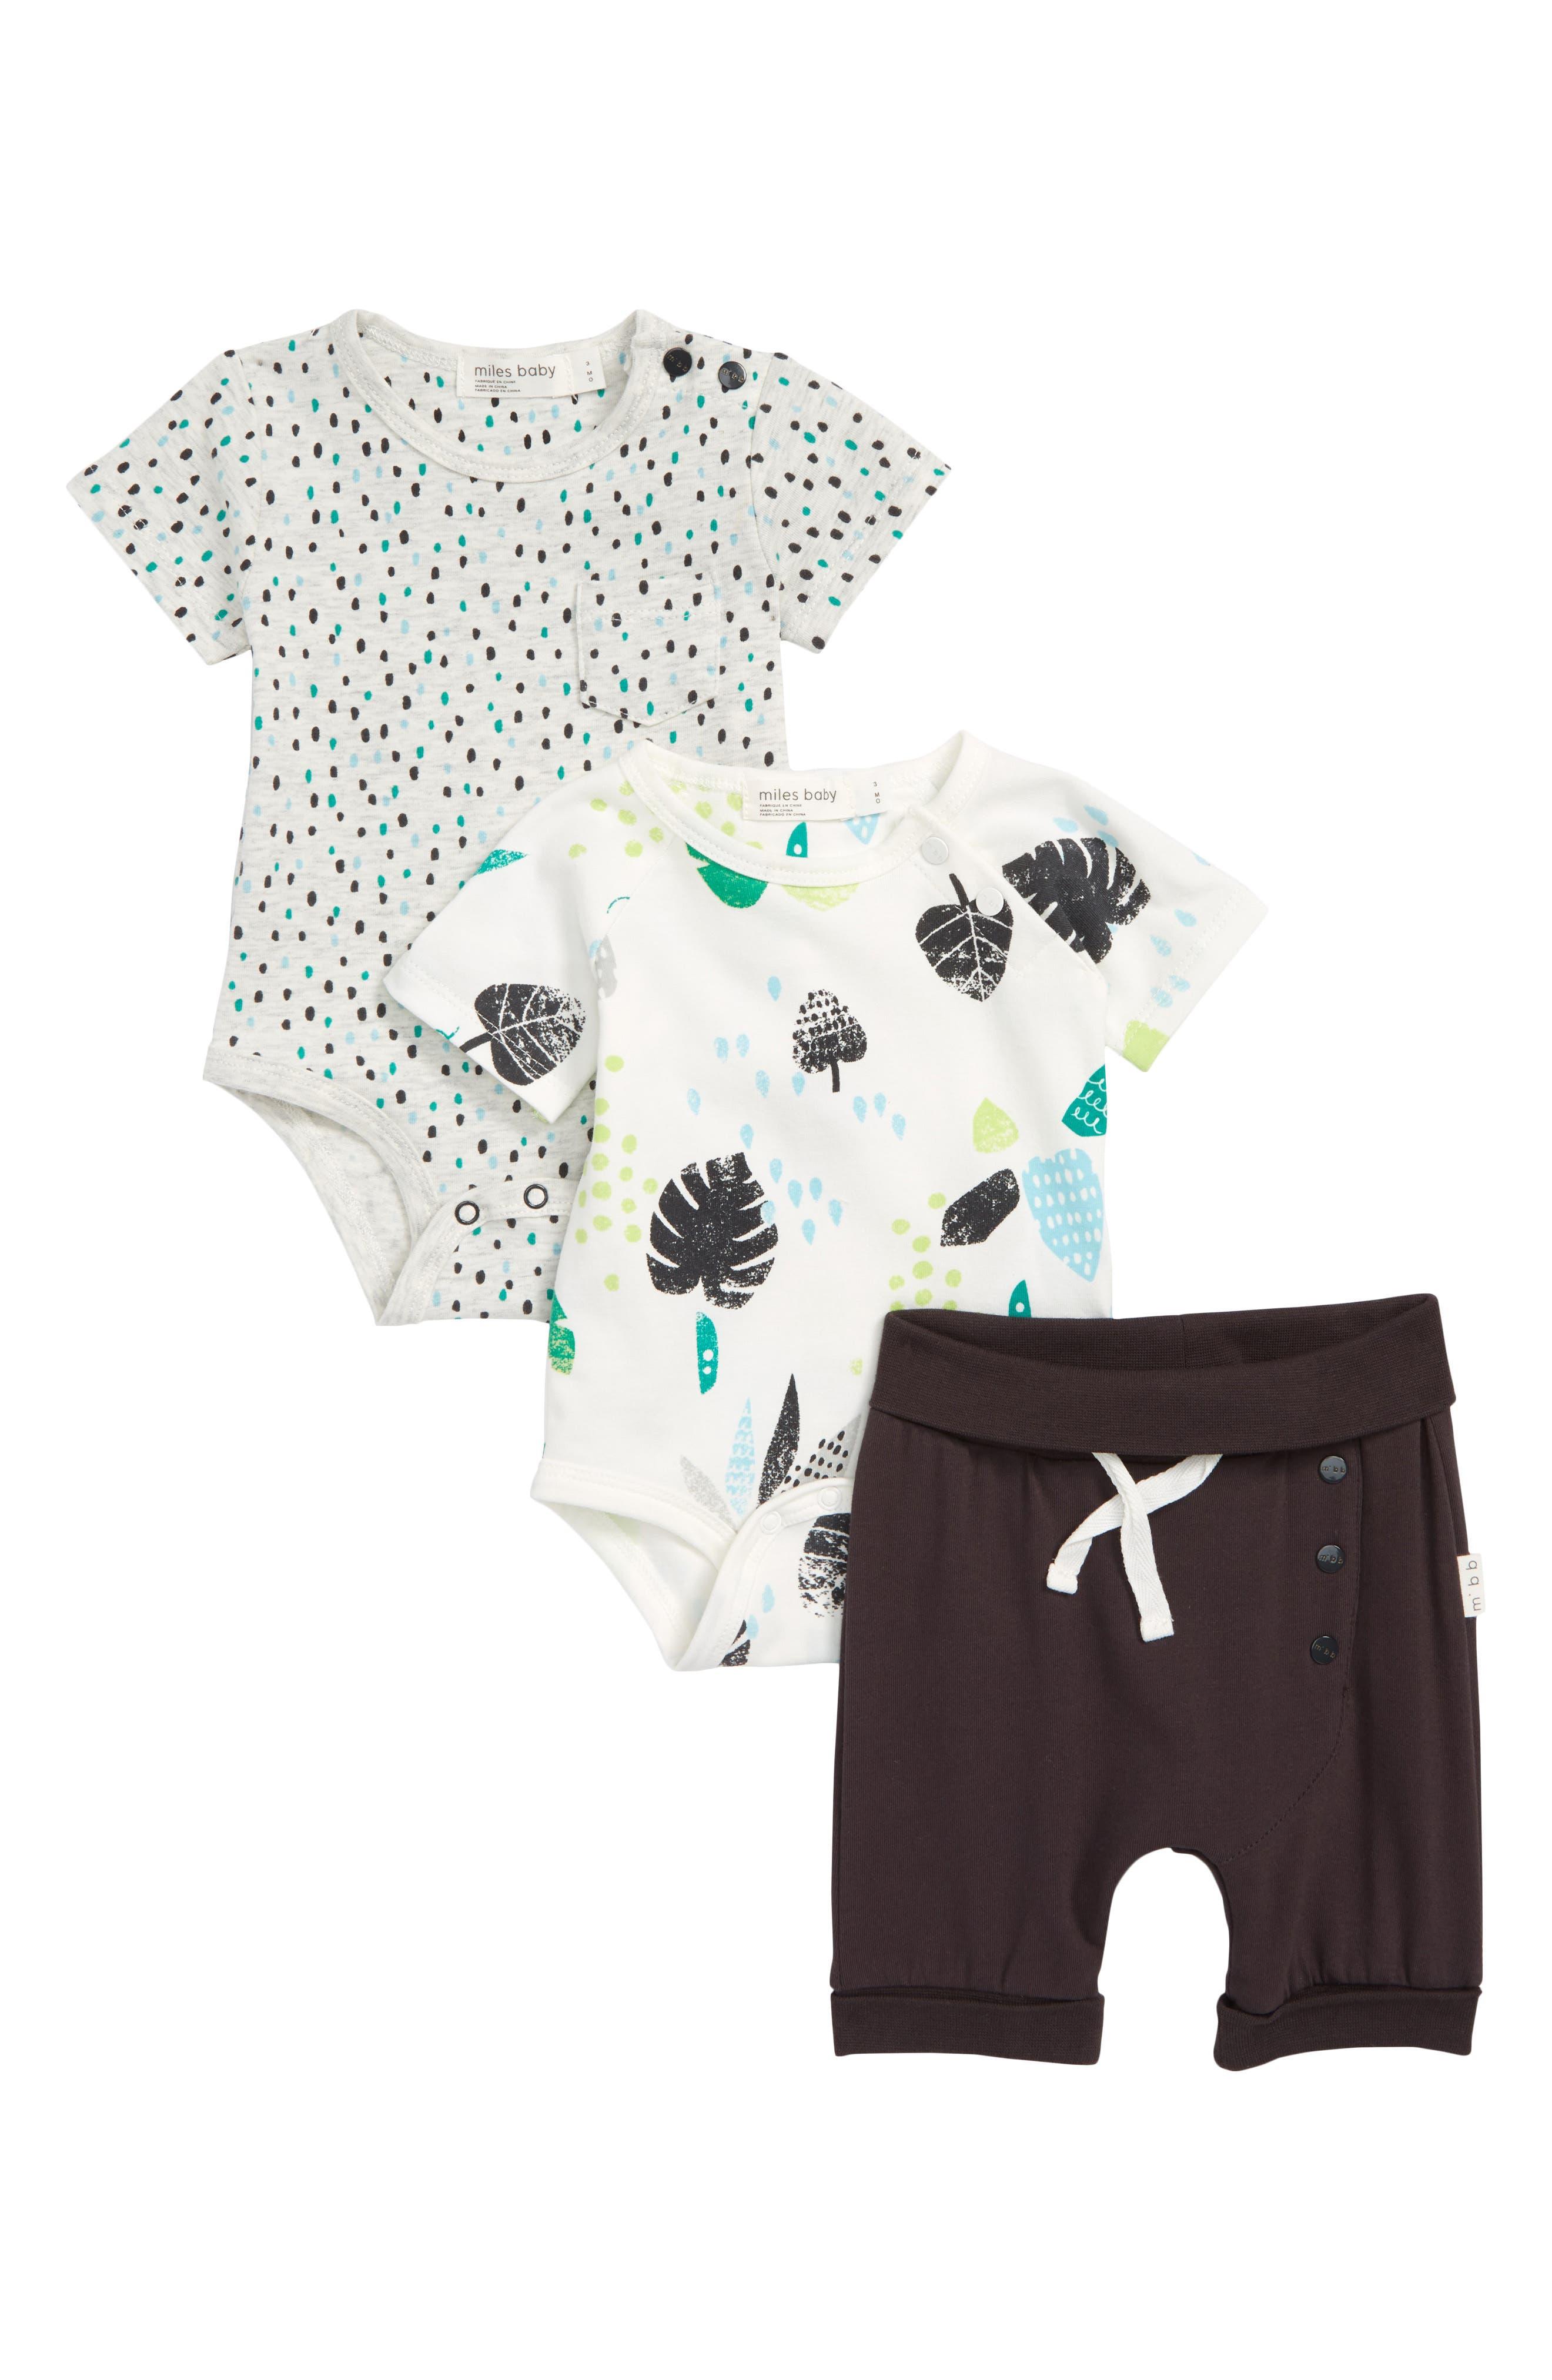 Miles Baby 3-Piece Bodysuit & Shorts Set (Baby)